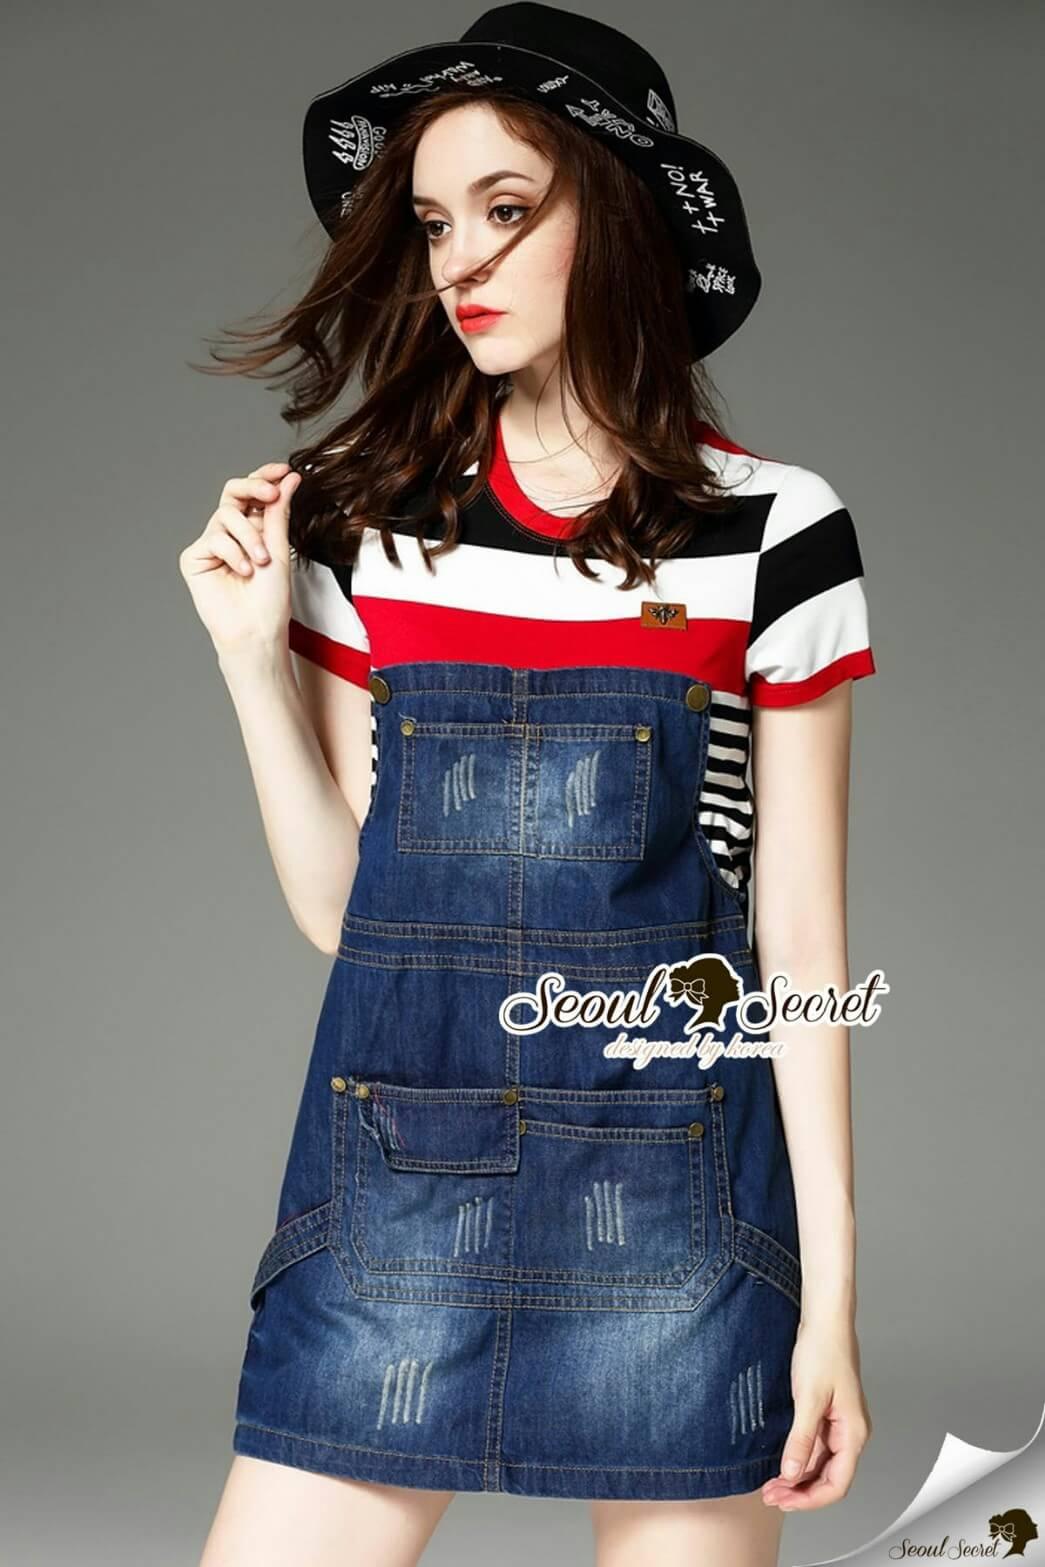 Seoul Secret Say's .... Almanda Chic Stipy Denim Dress